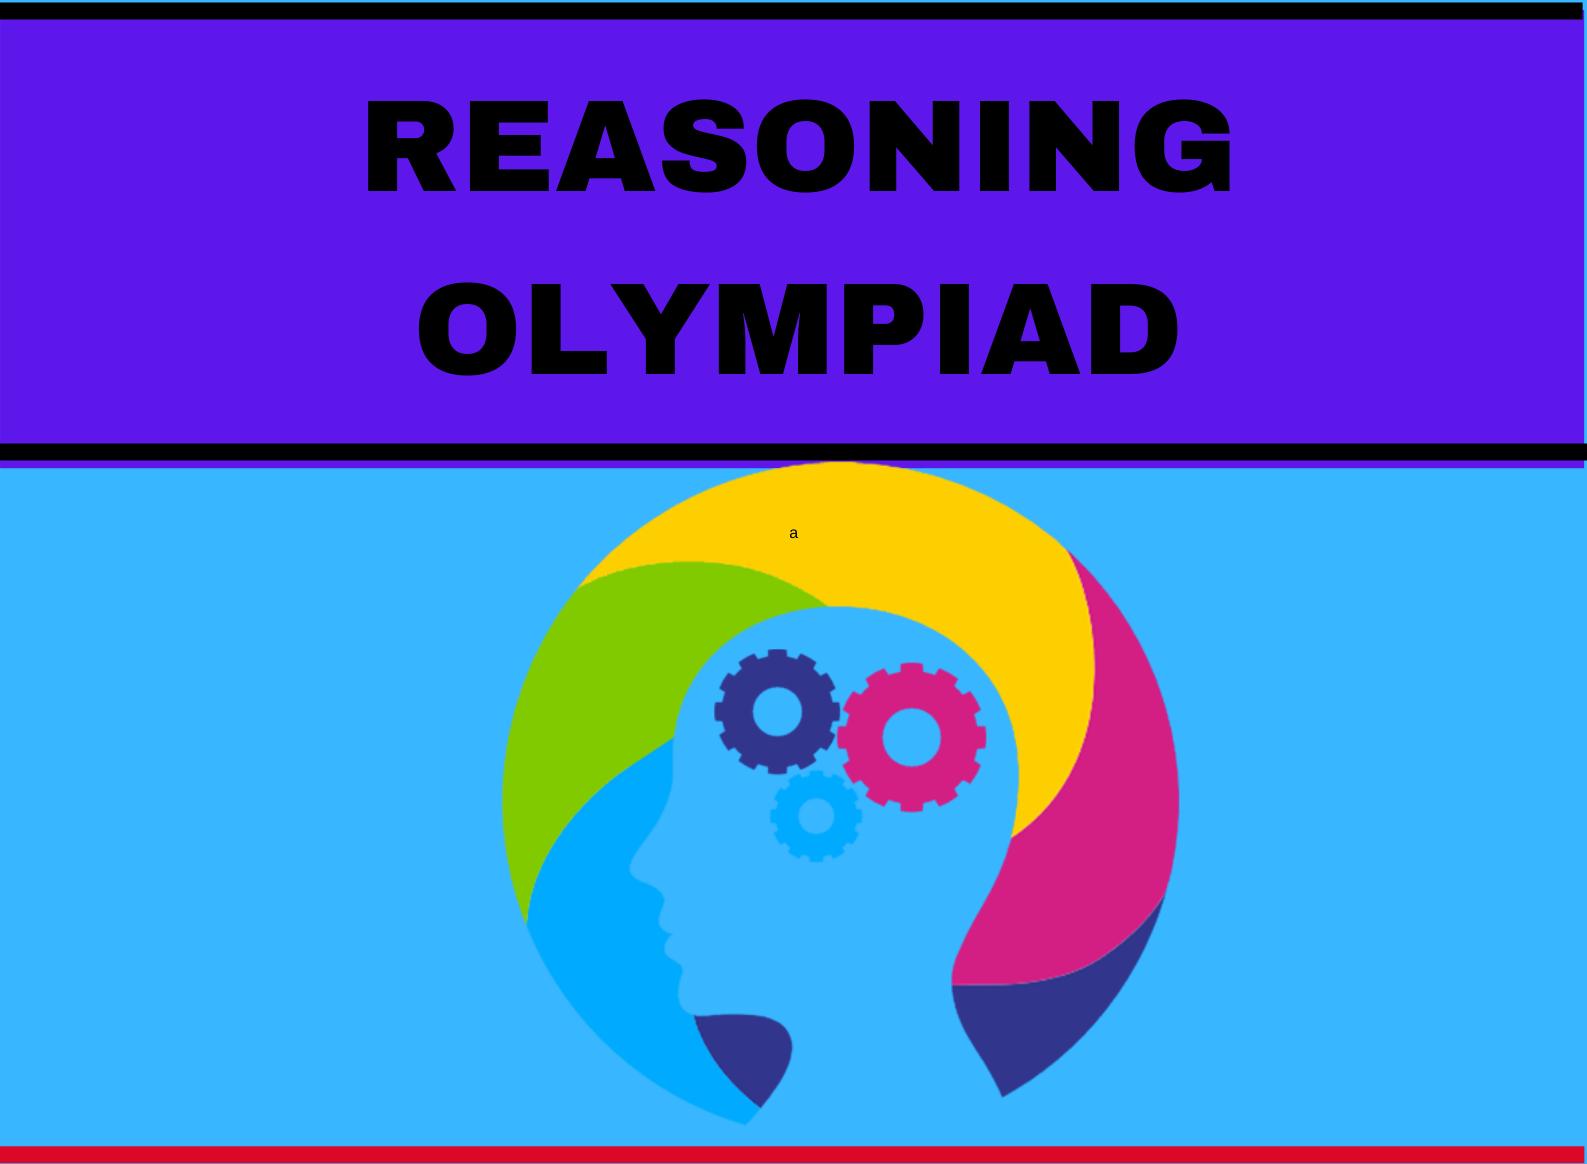 REASONING OLYMPIAD POSTER